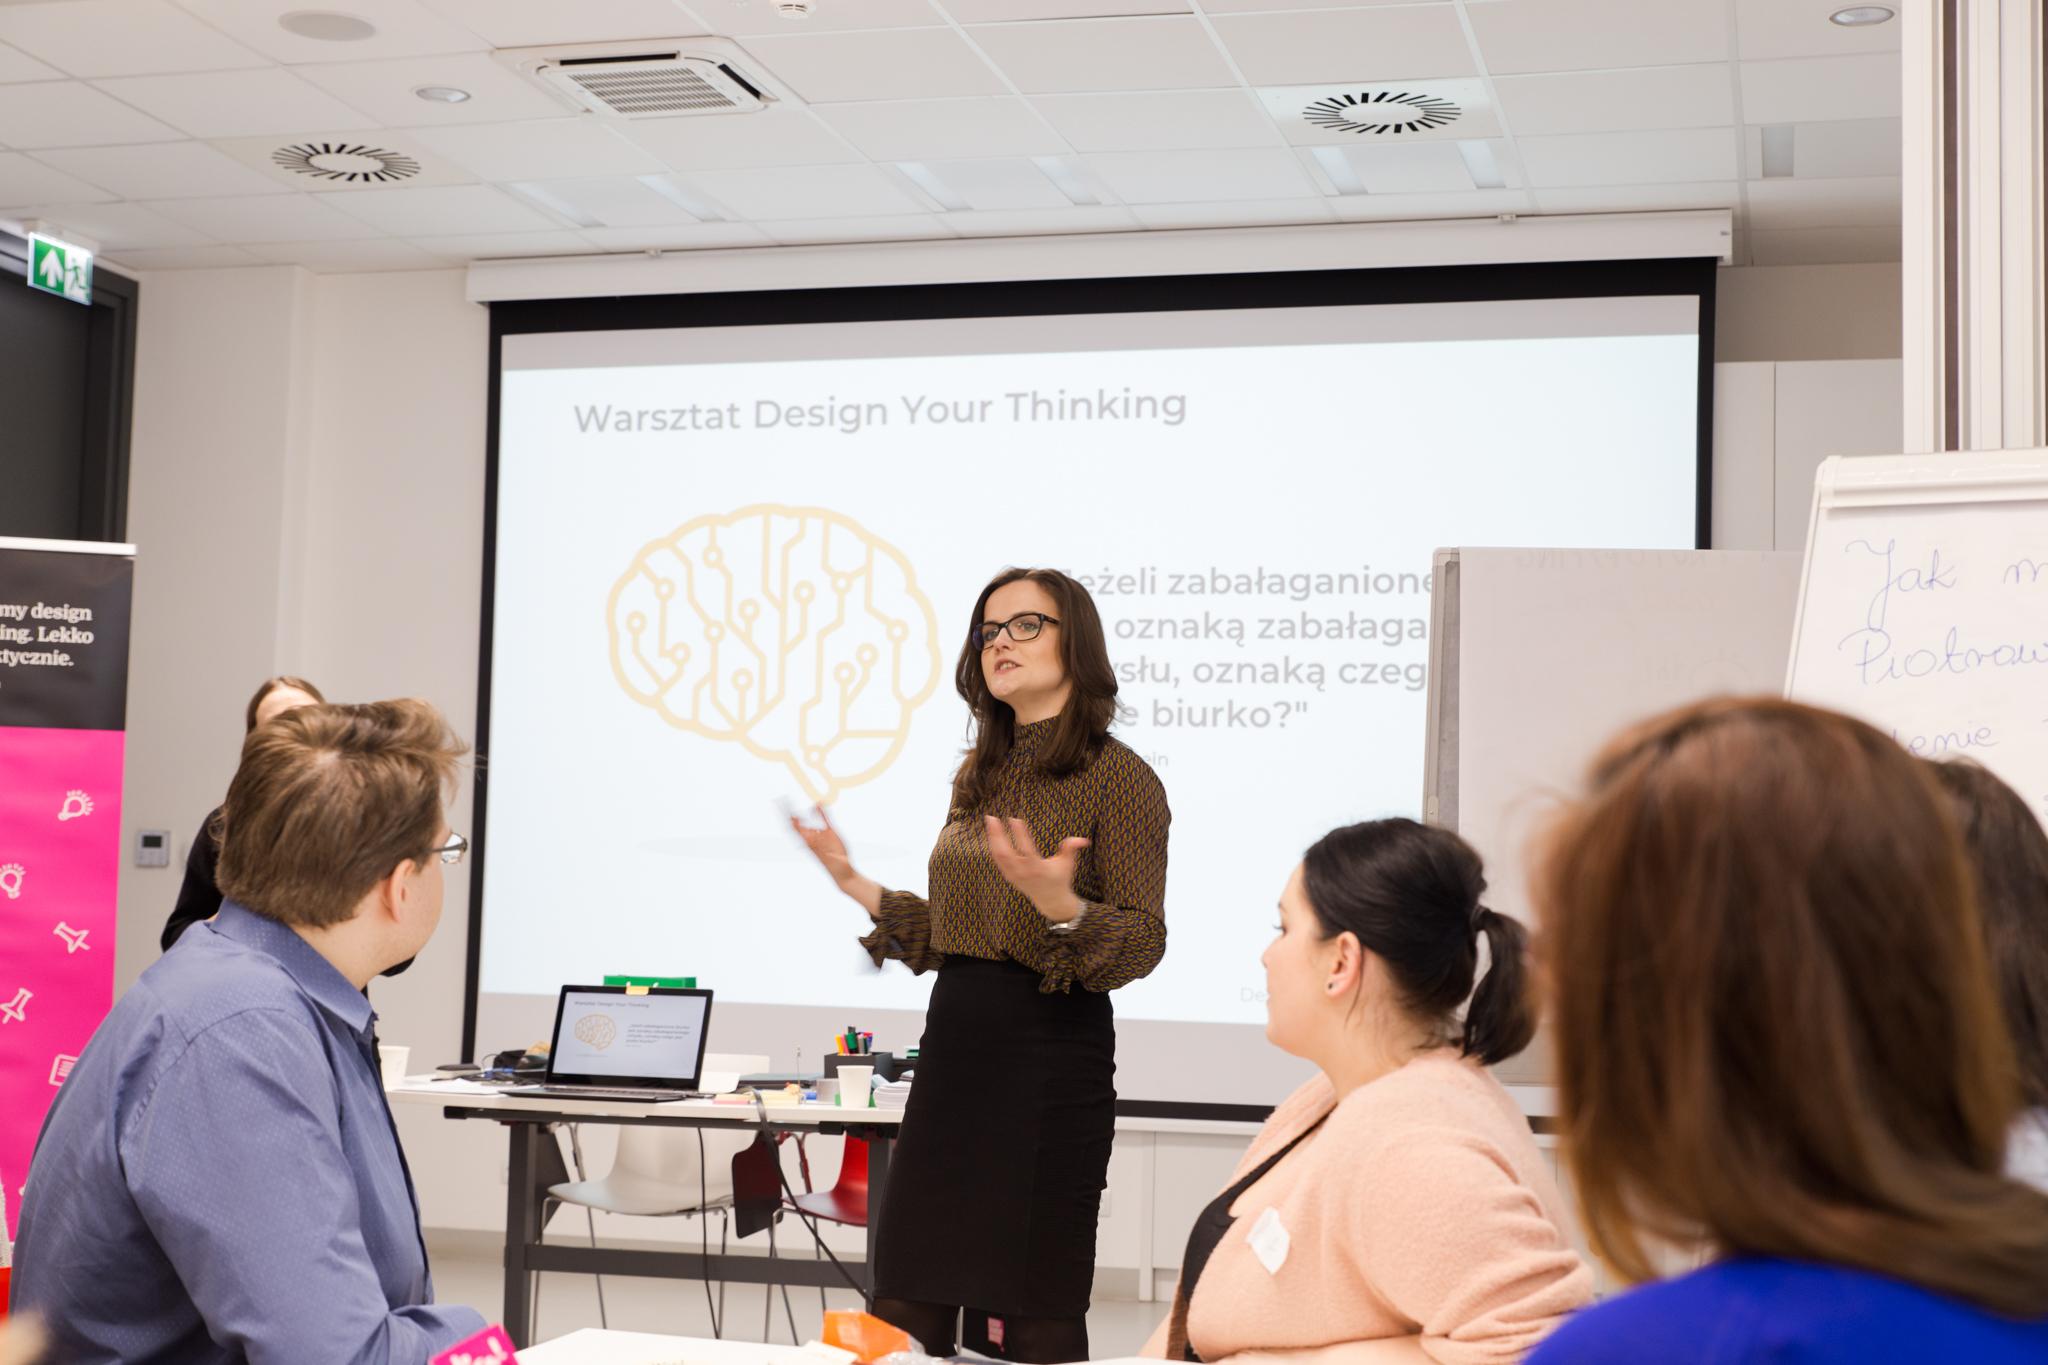 https://designthinkingfest.pl/wp-content/uploads/2019/03/IMG_0070.jpg